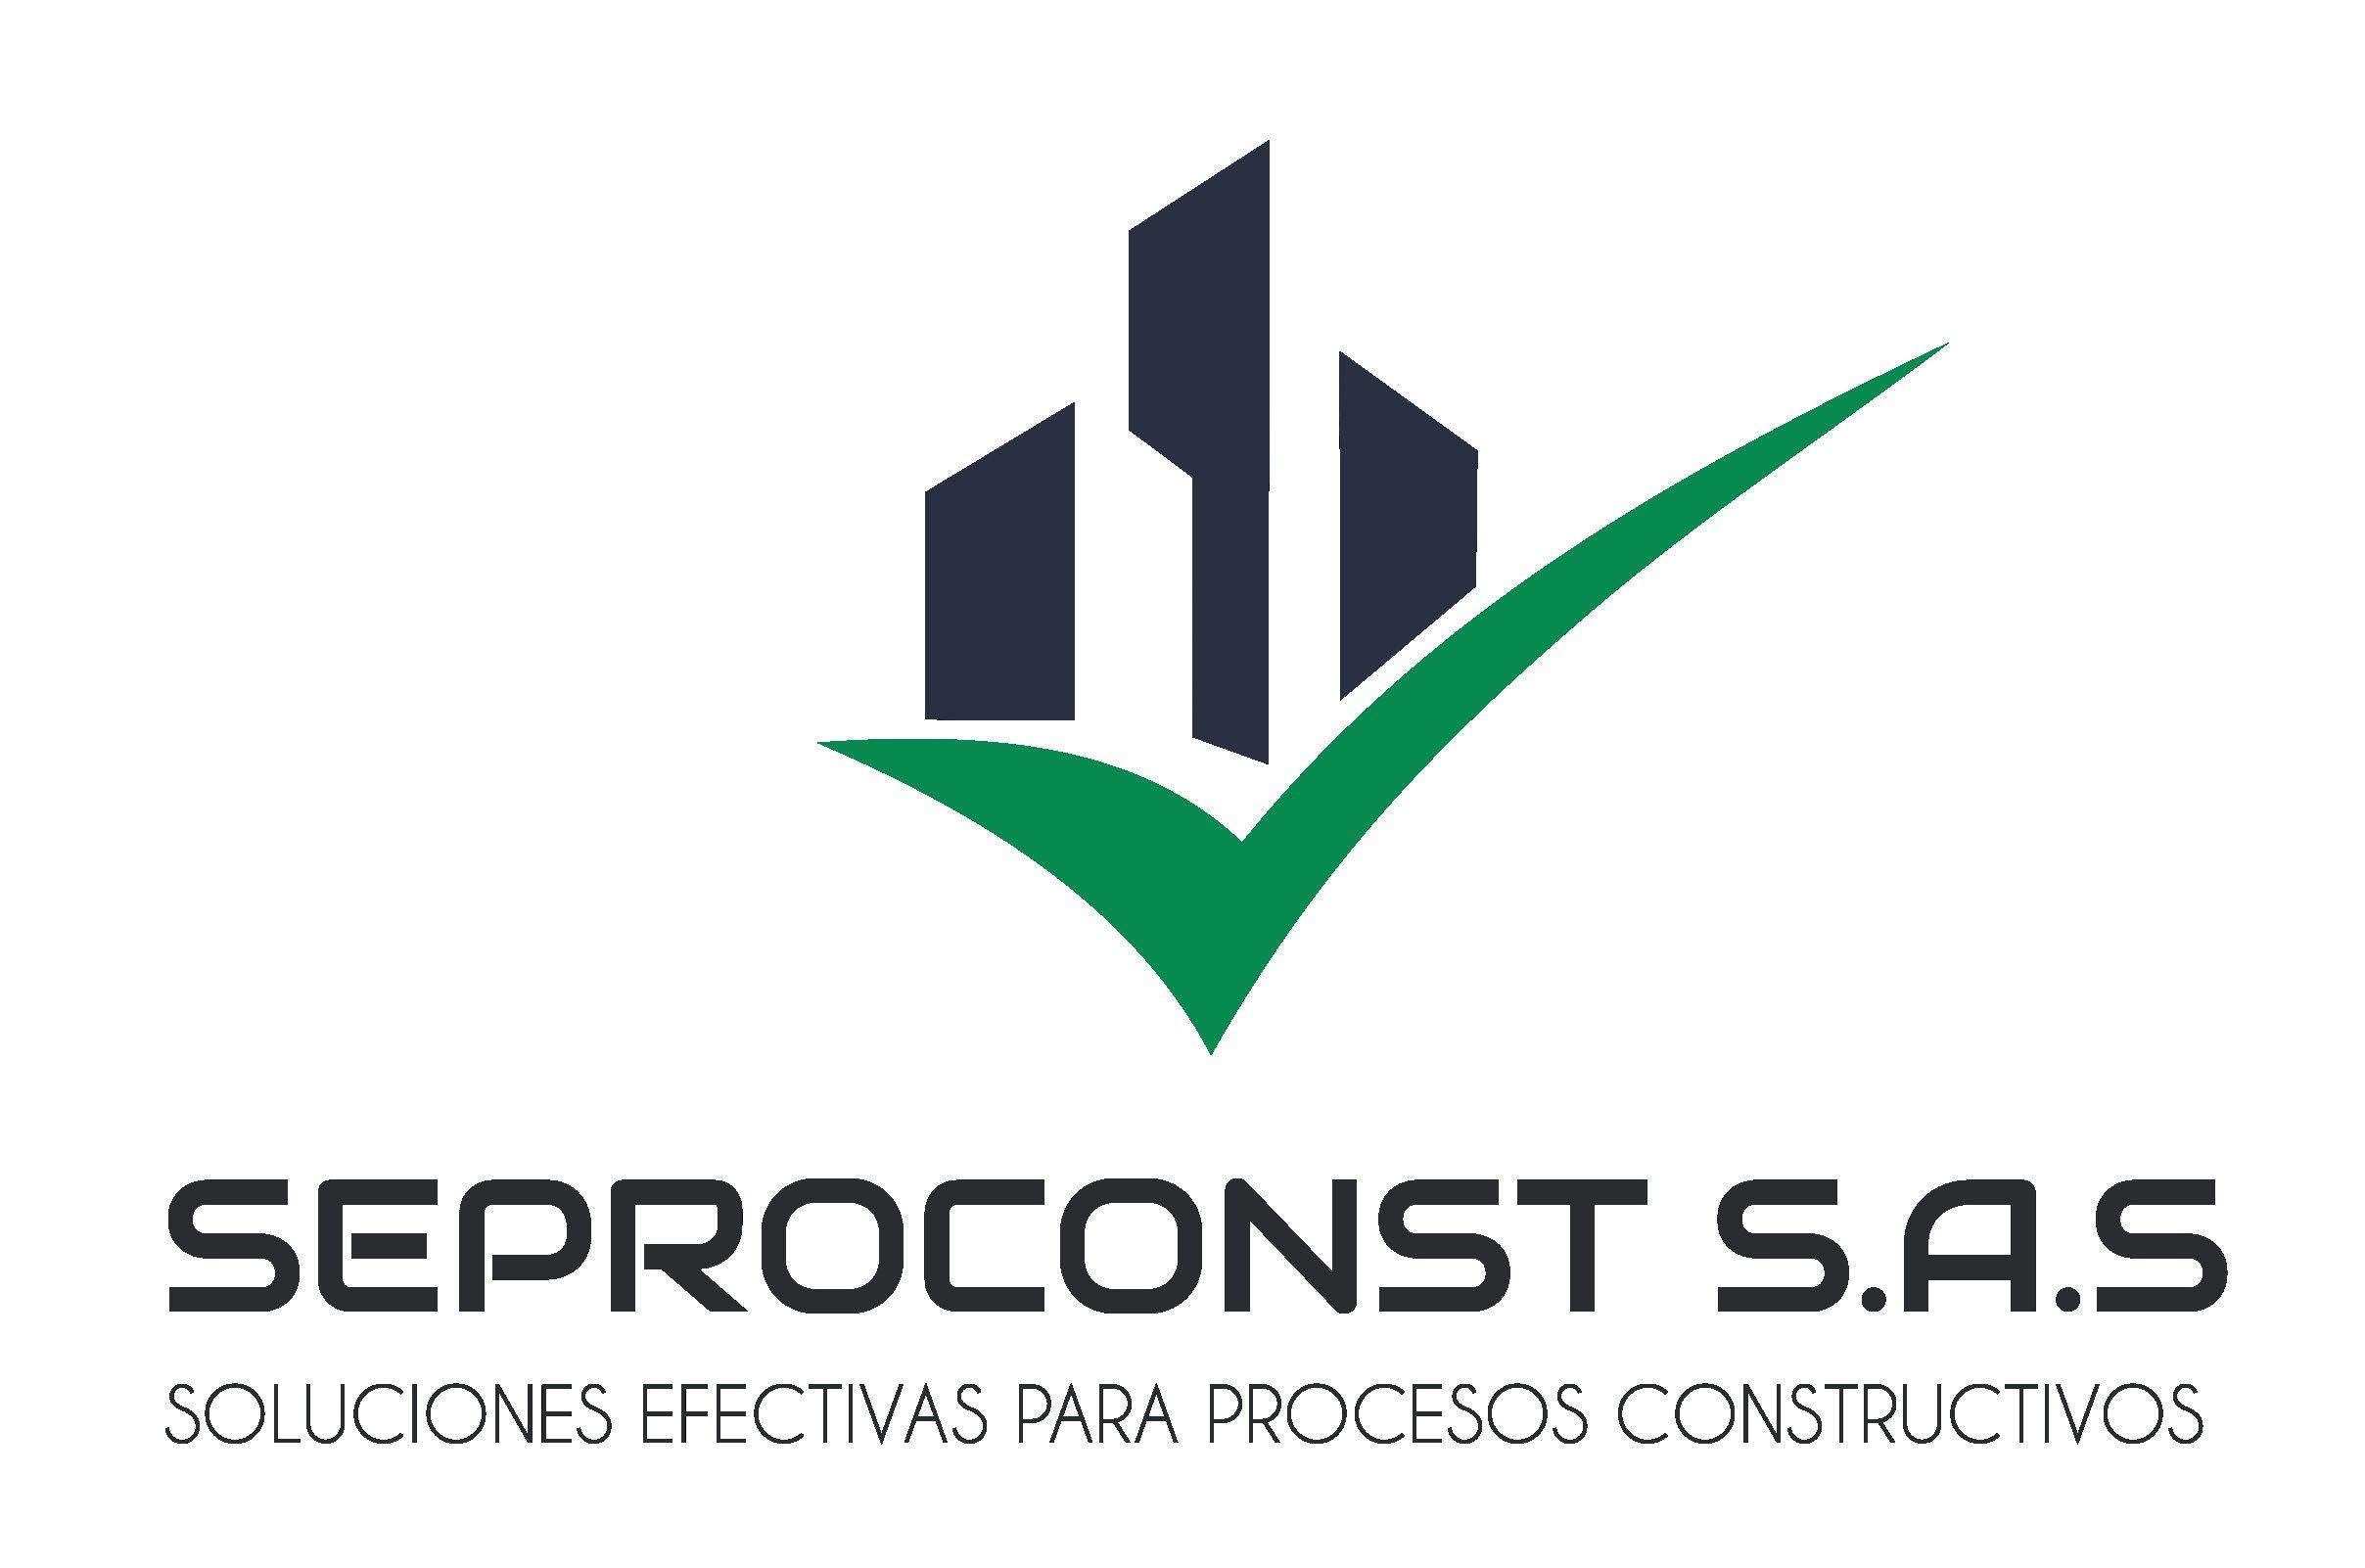 SEPROCONST S.A.S.